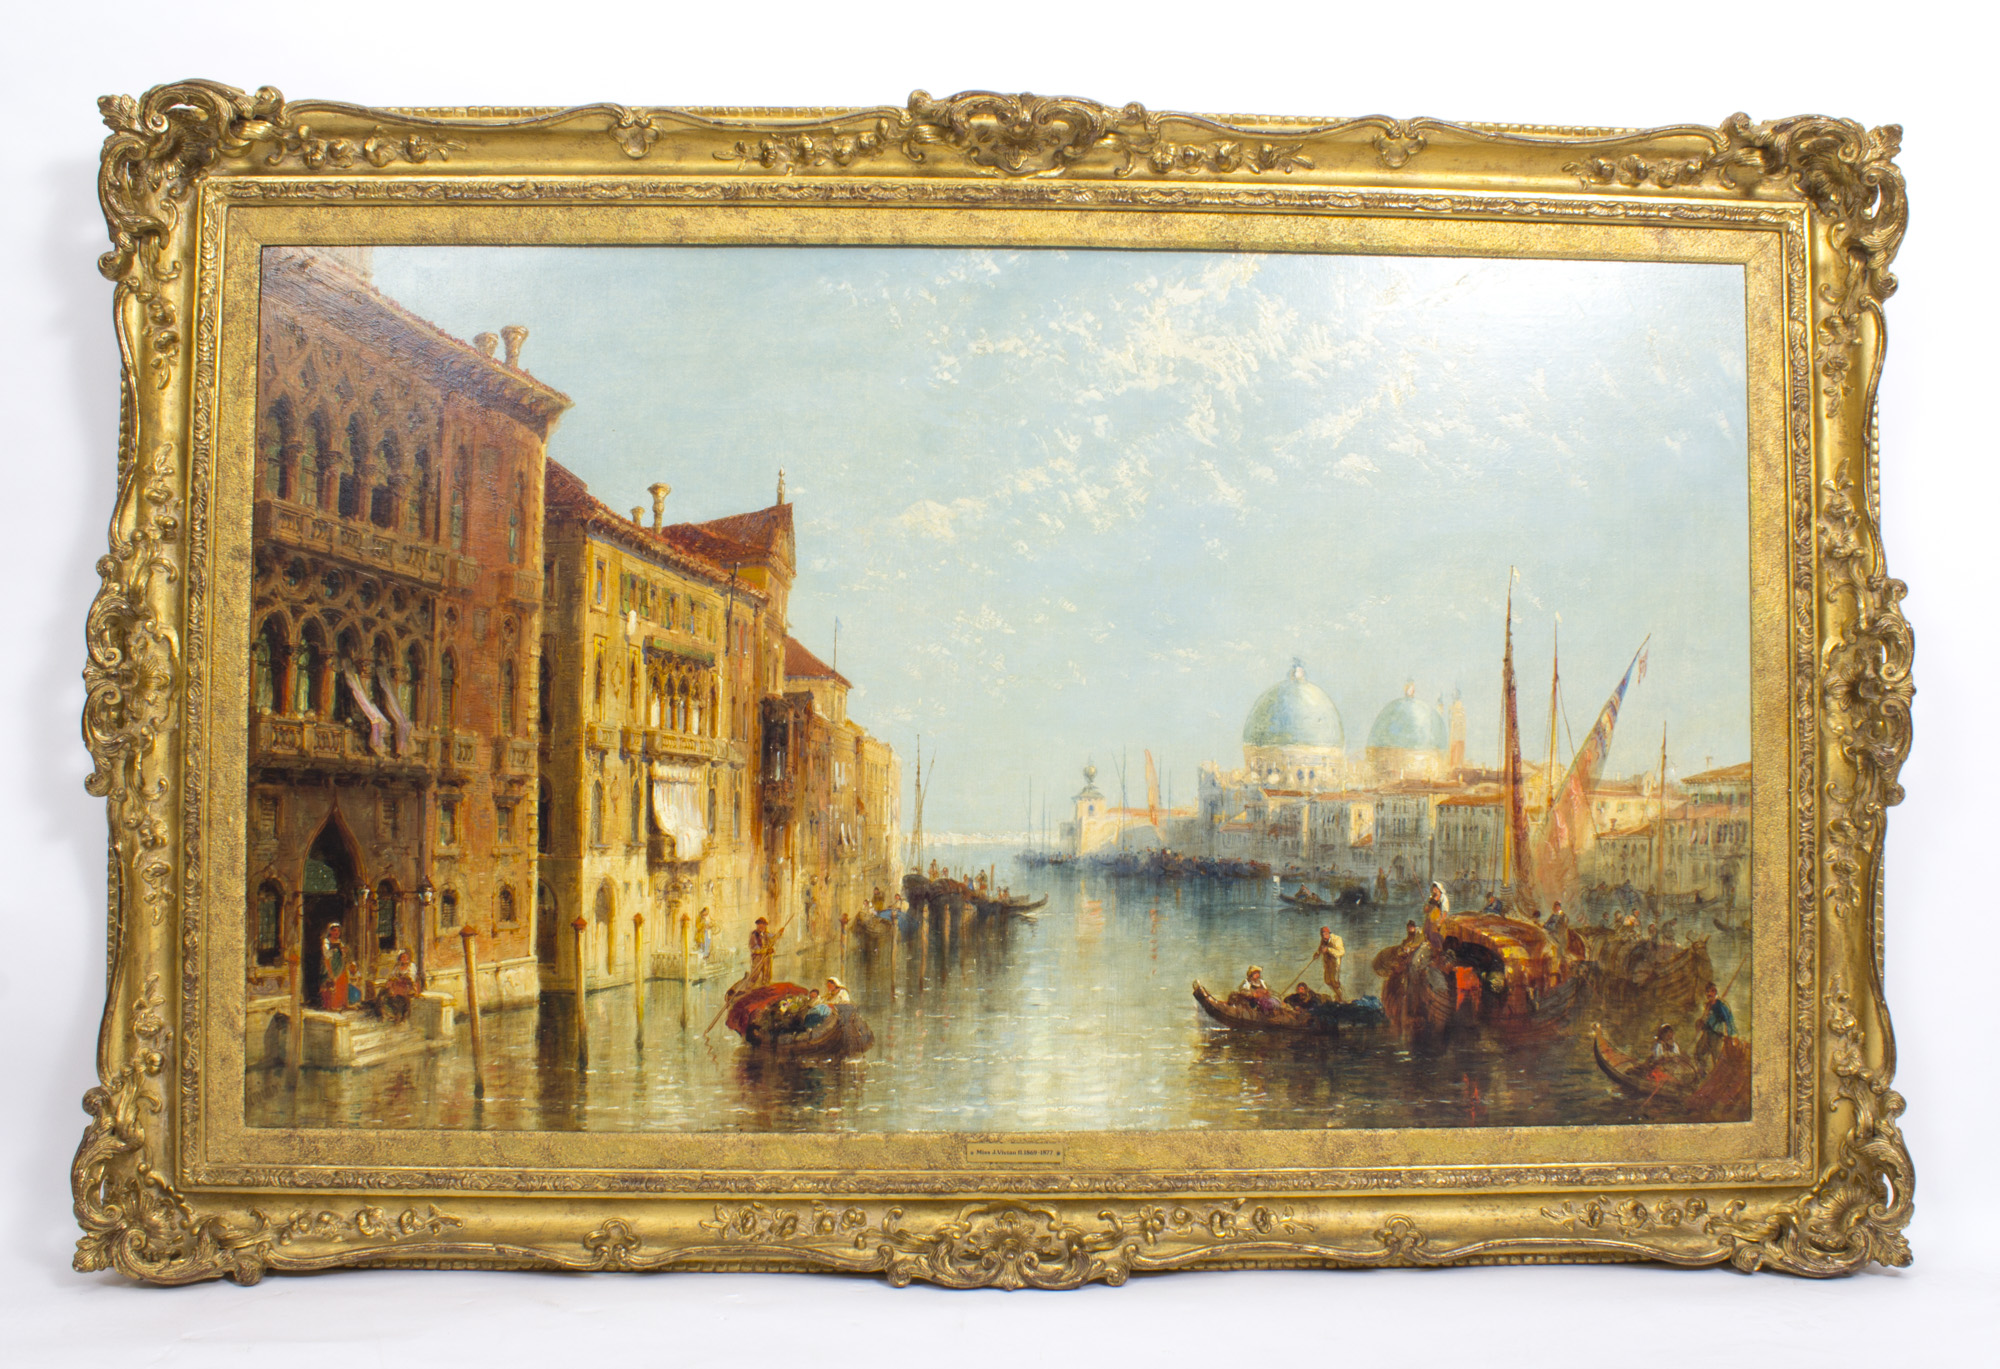 20x30 26x39 in 16x24 Vintage Landscape Print or Canvas \u2013 6x9 8x12 Original Artwork 12x18 Altered Antique Oil Painting